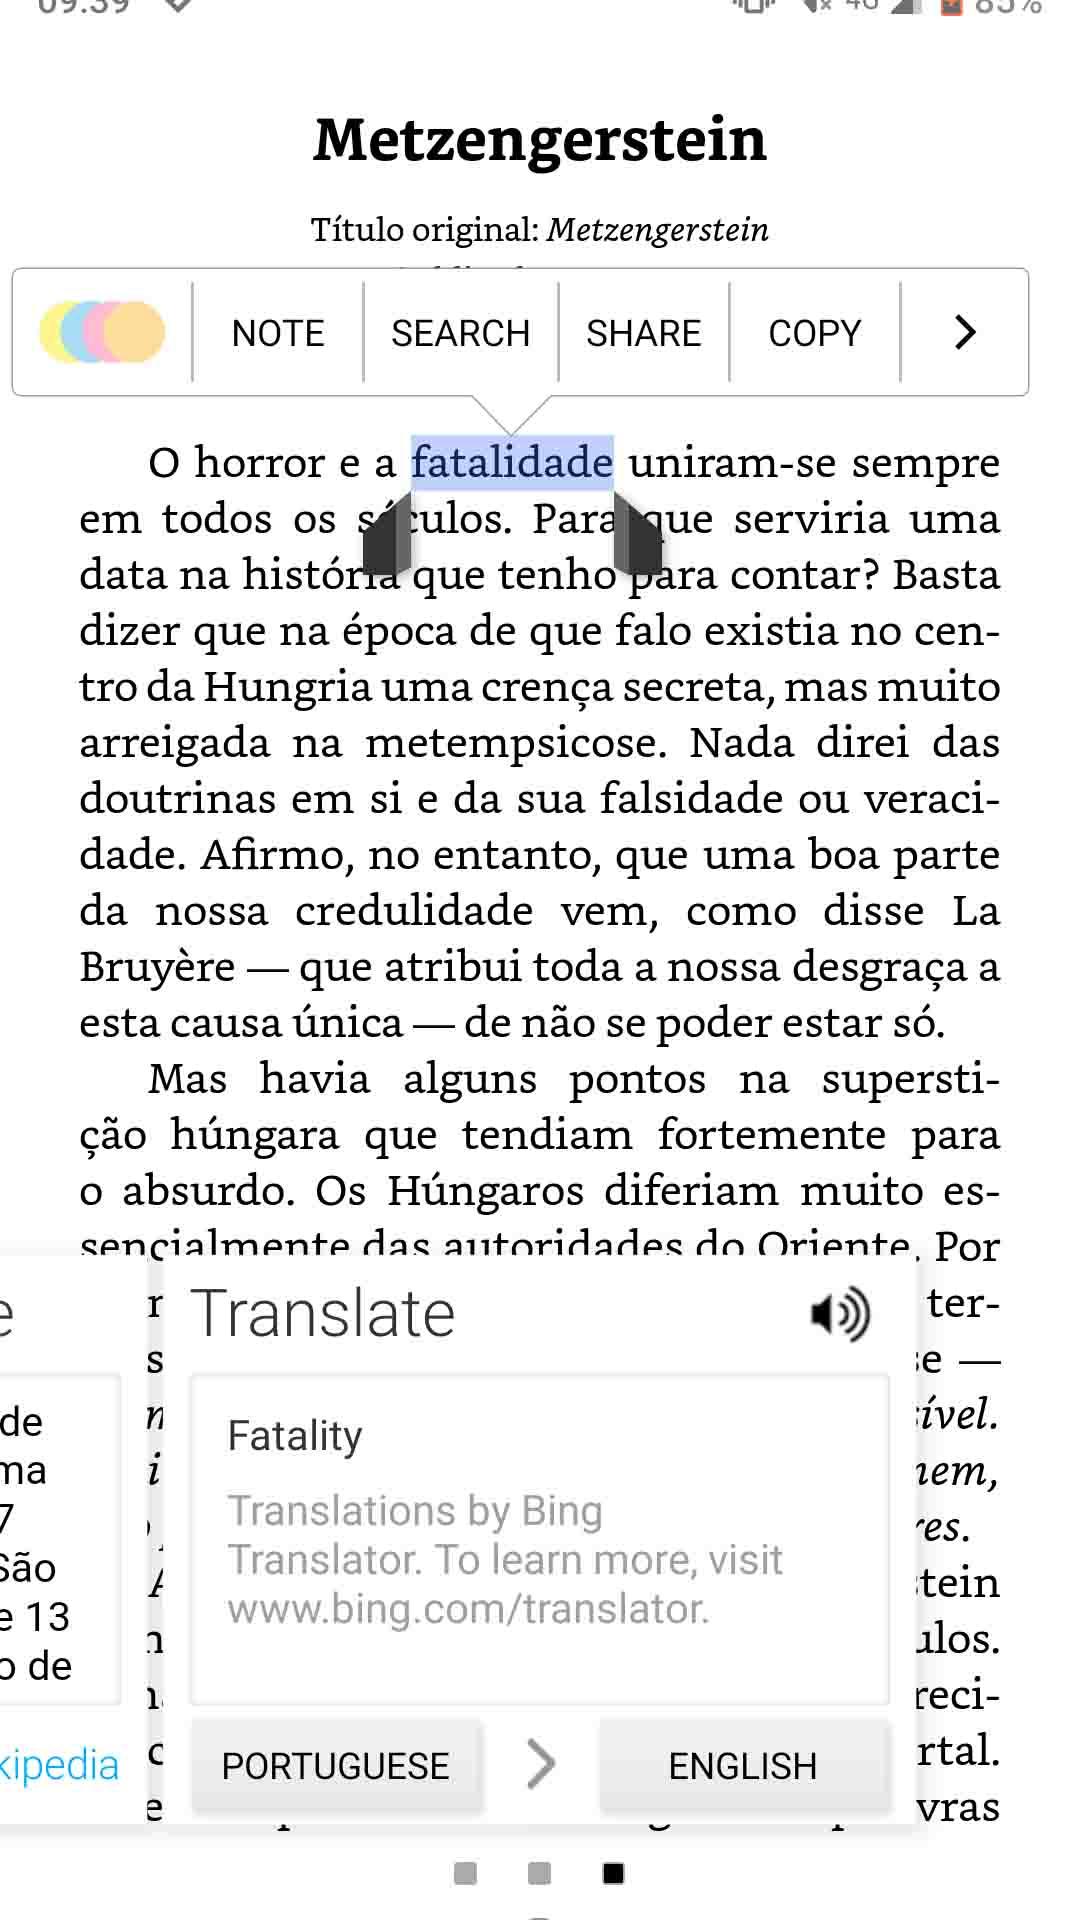 kindle app translating a word screenshot